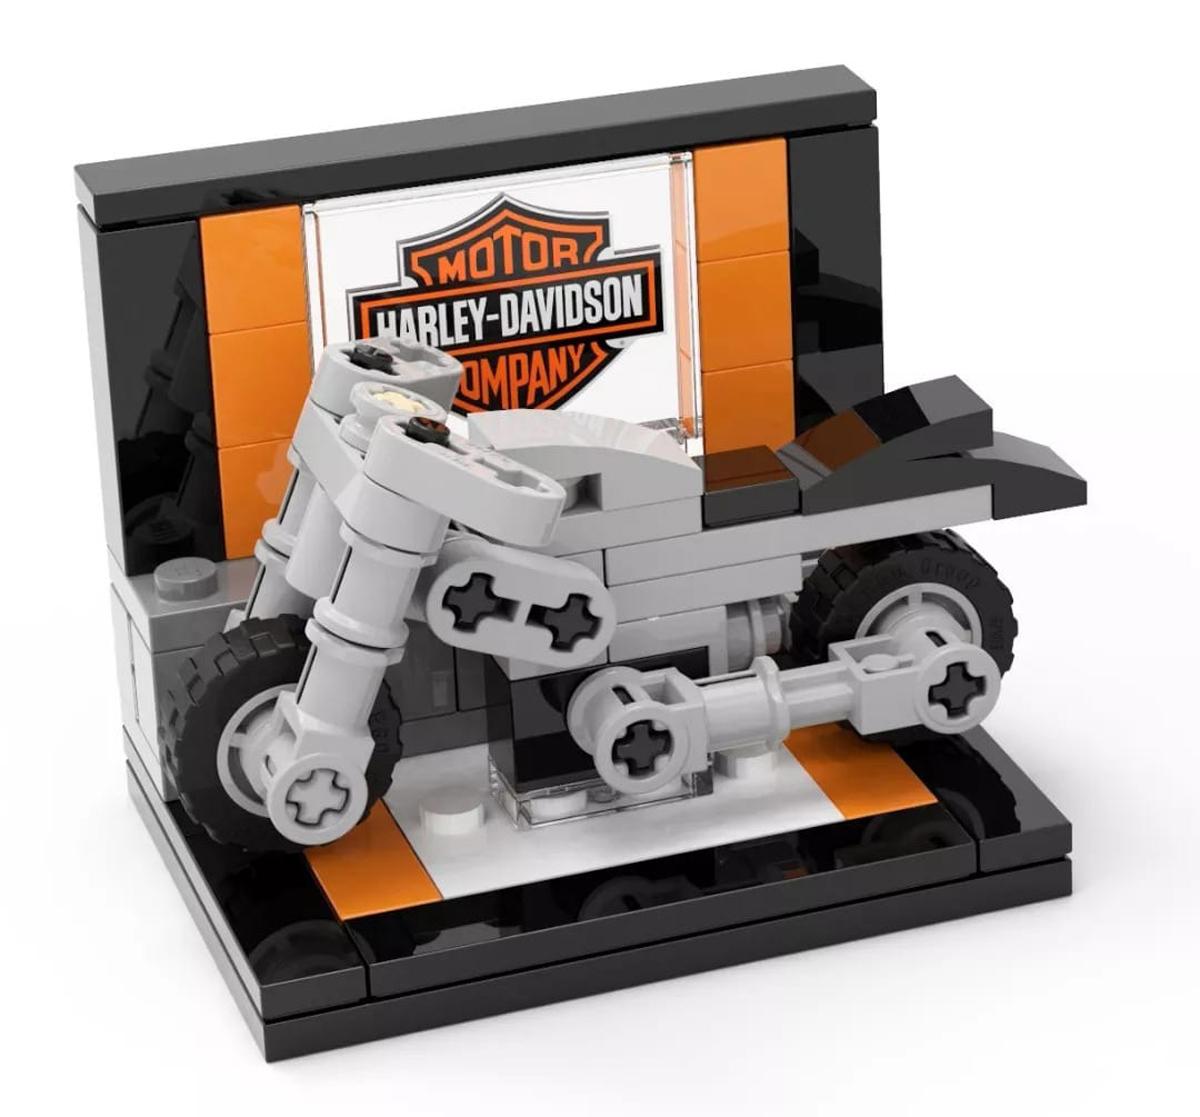 LEGO MOCs Archives - The Brick Show